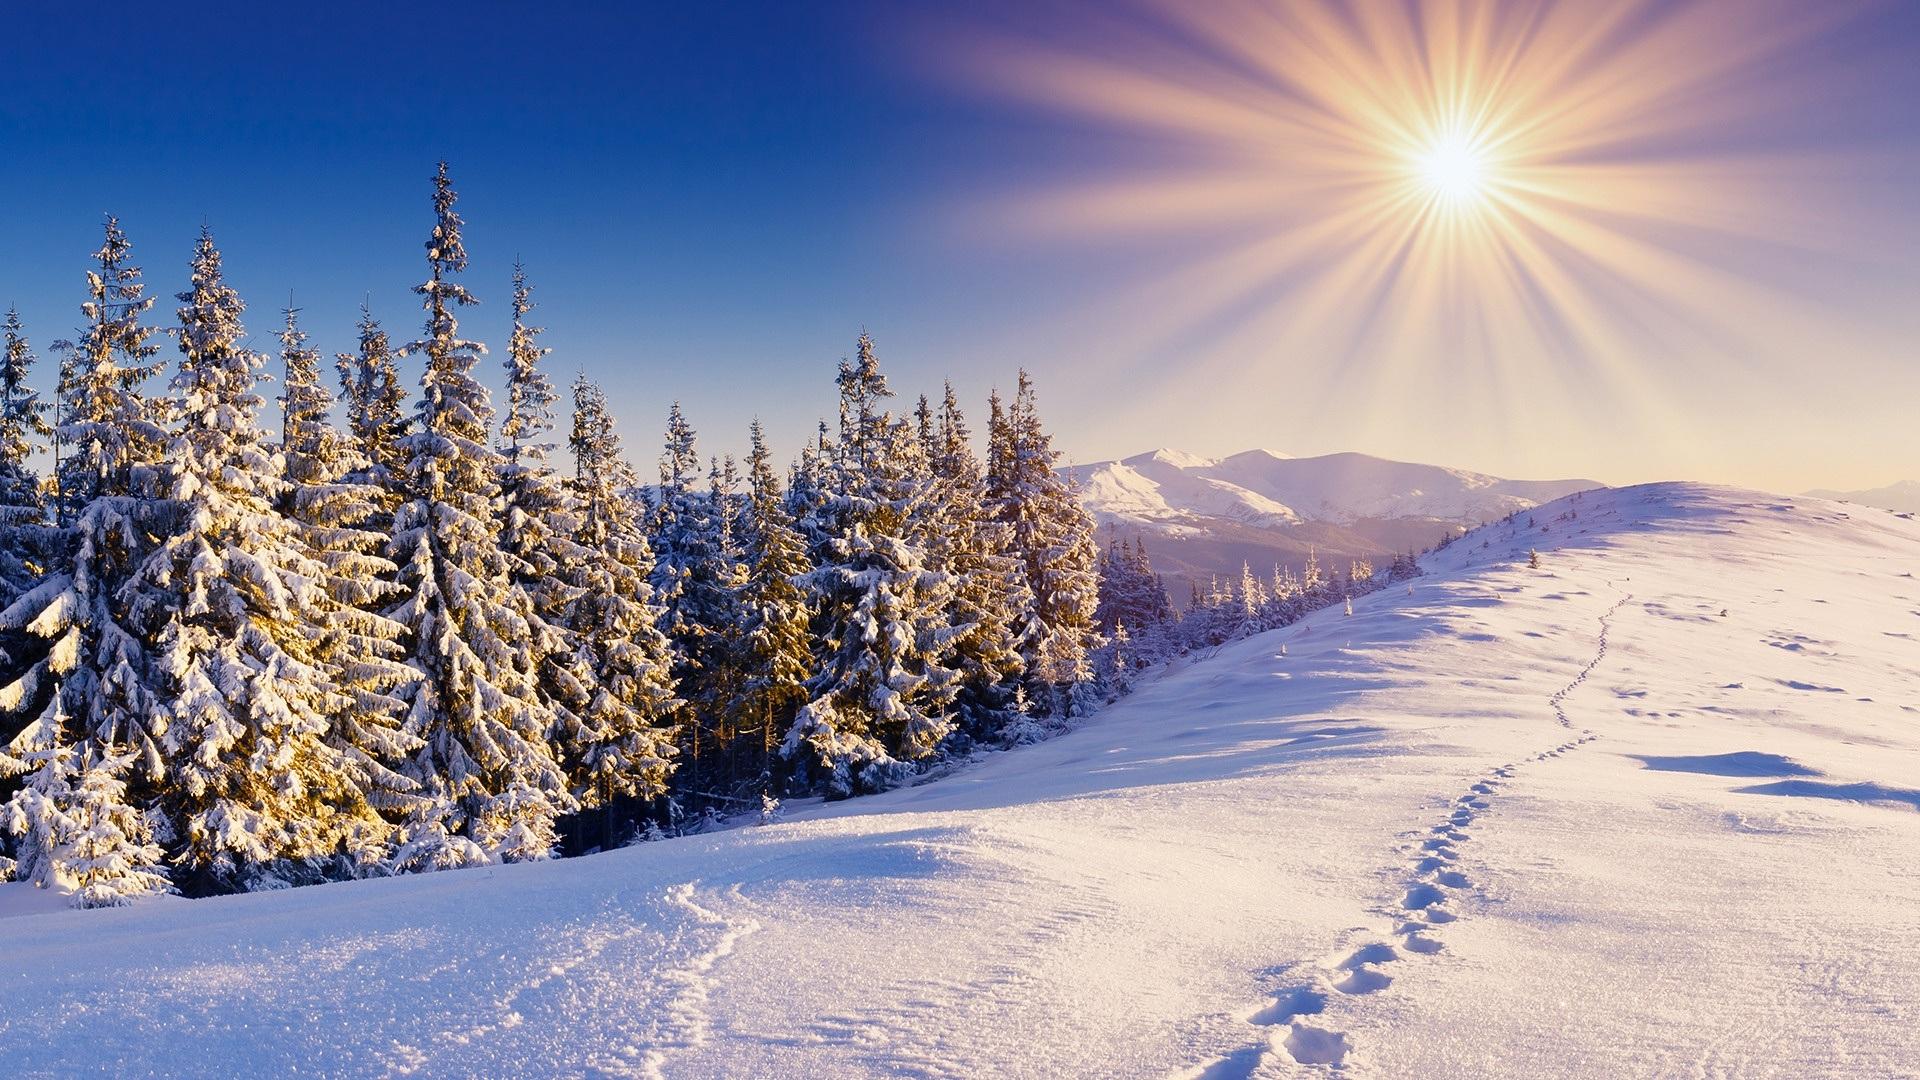 Winter wallpapers high quality download free - Winter desktop ...